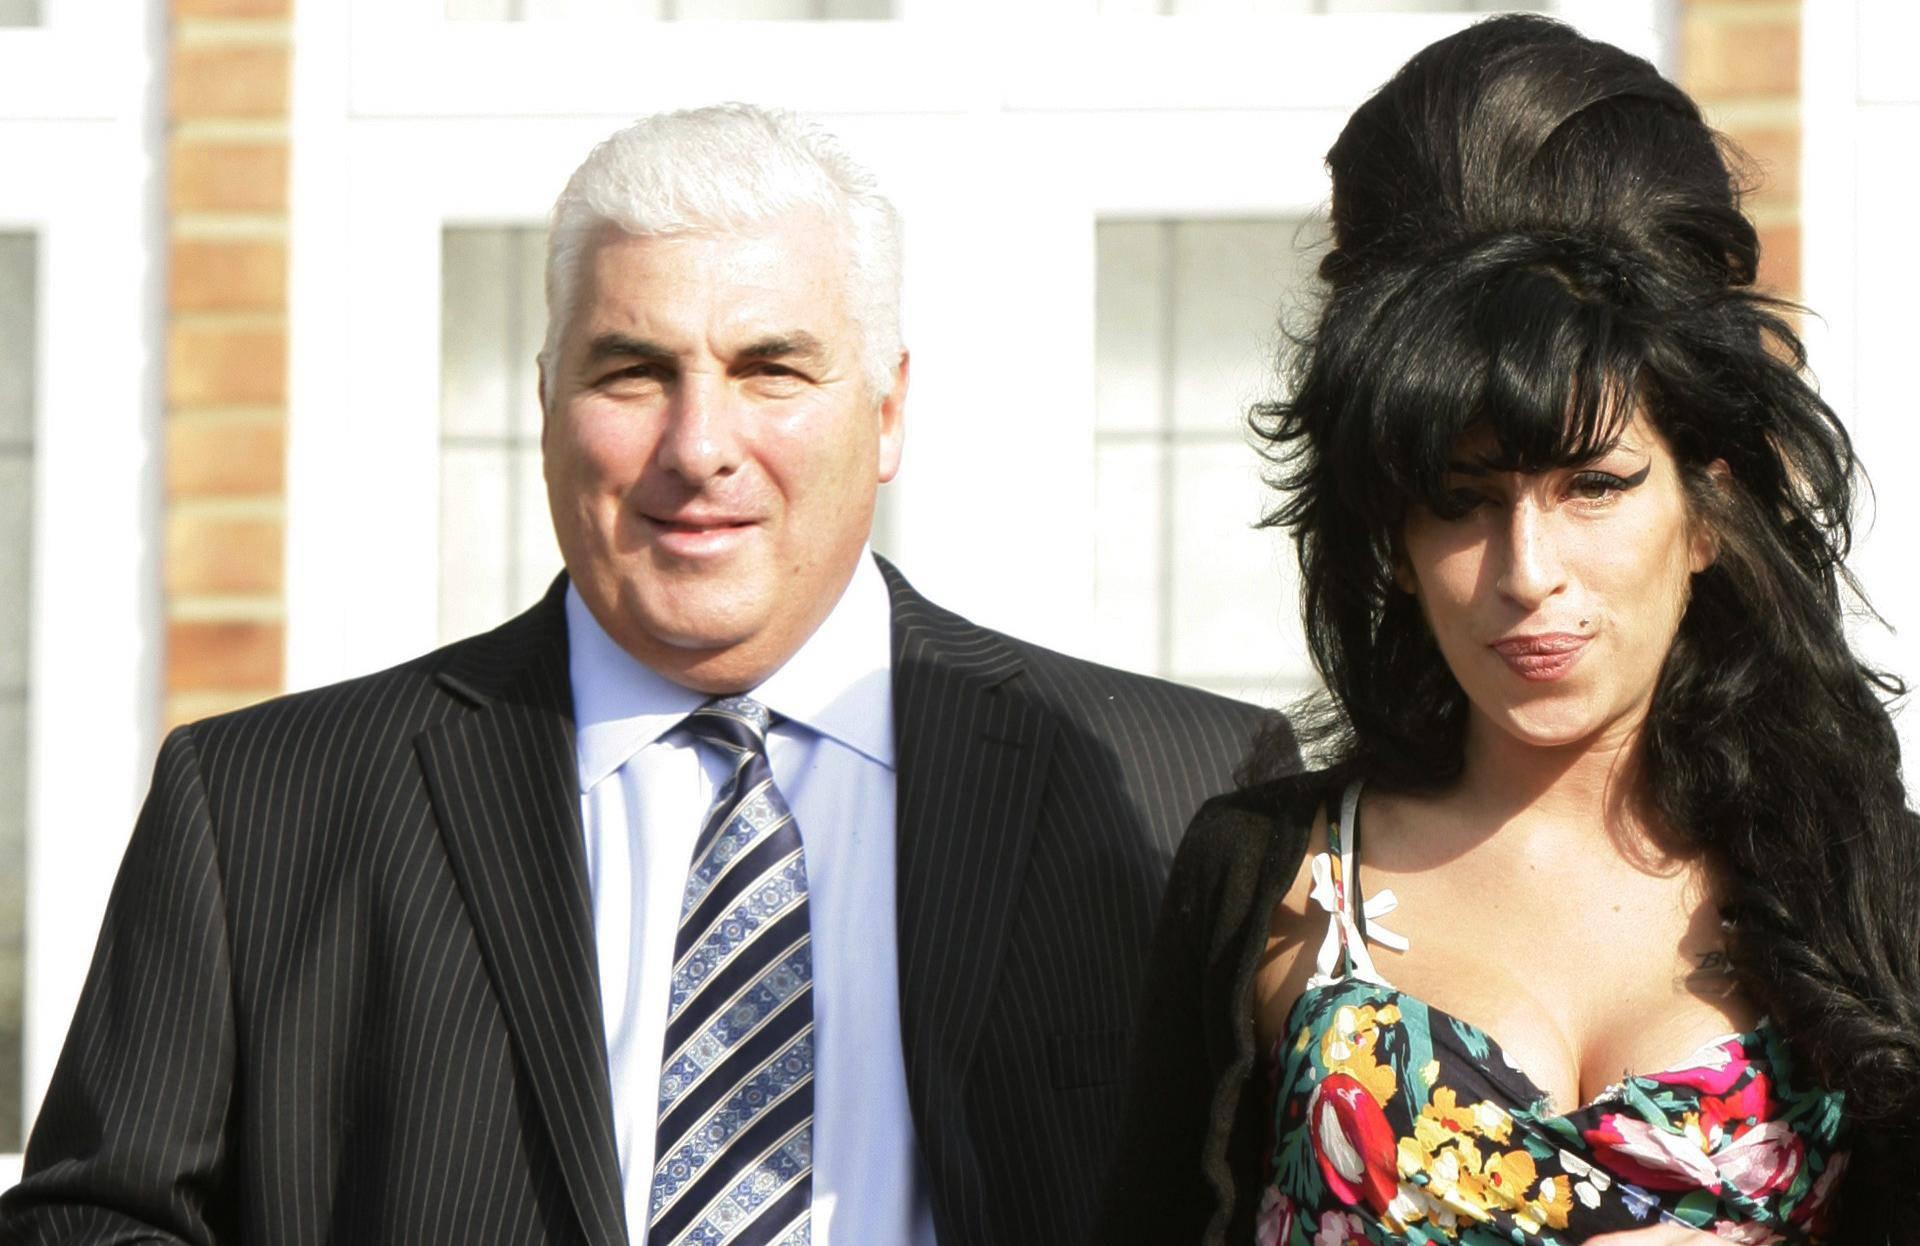 Winehouse in court